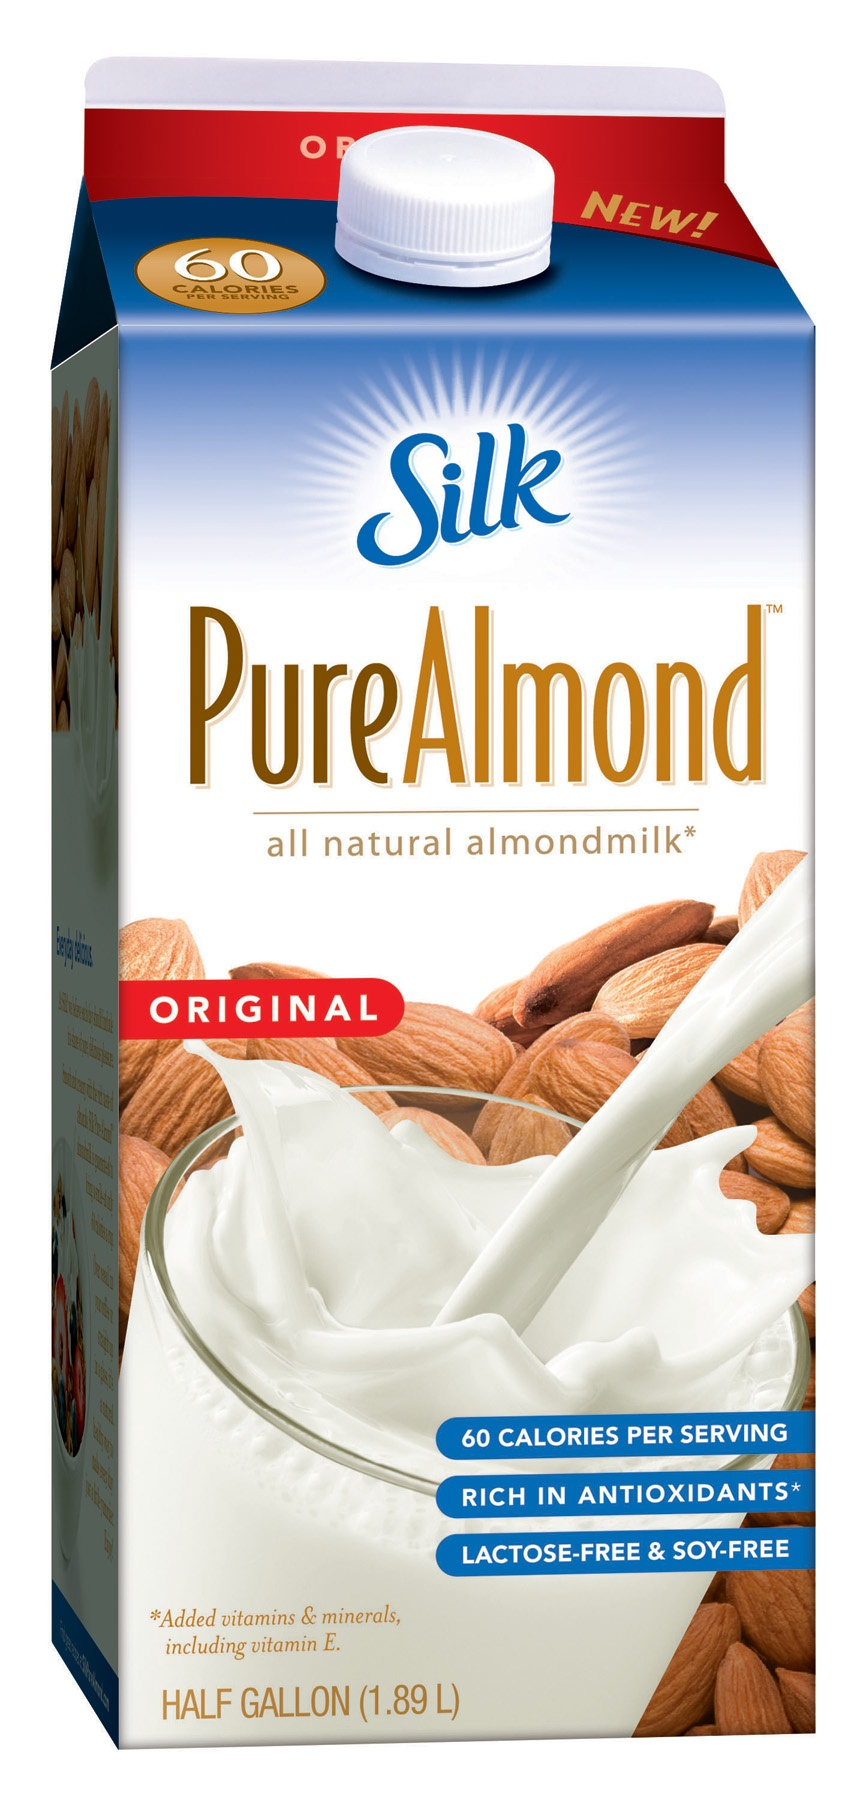 Print Now* $1.25/2 Silk Almond Milk Or $0.60/1 Silk Soymilk For - Free Printable Silk Soy Milk Coupons